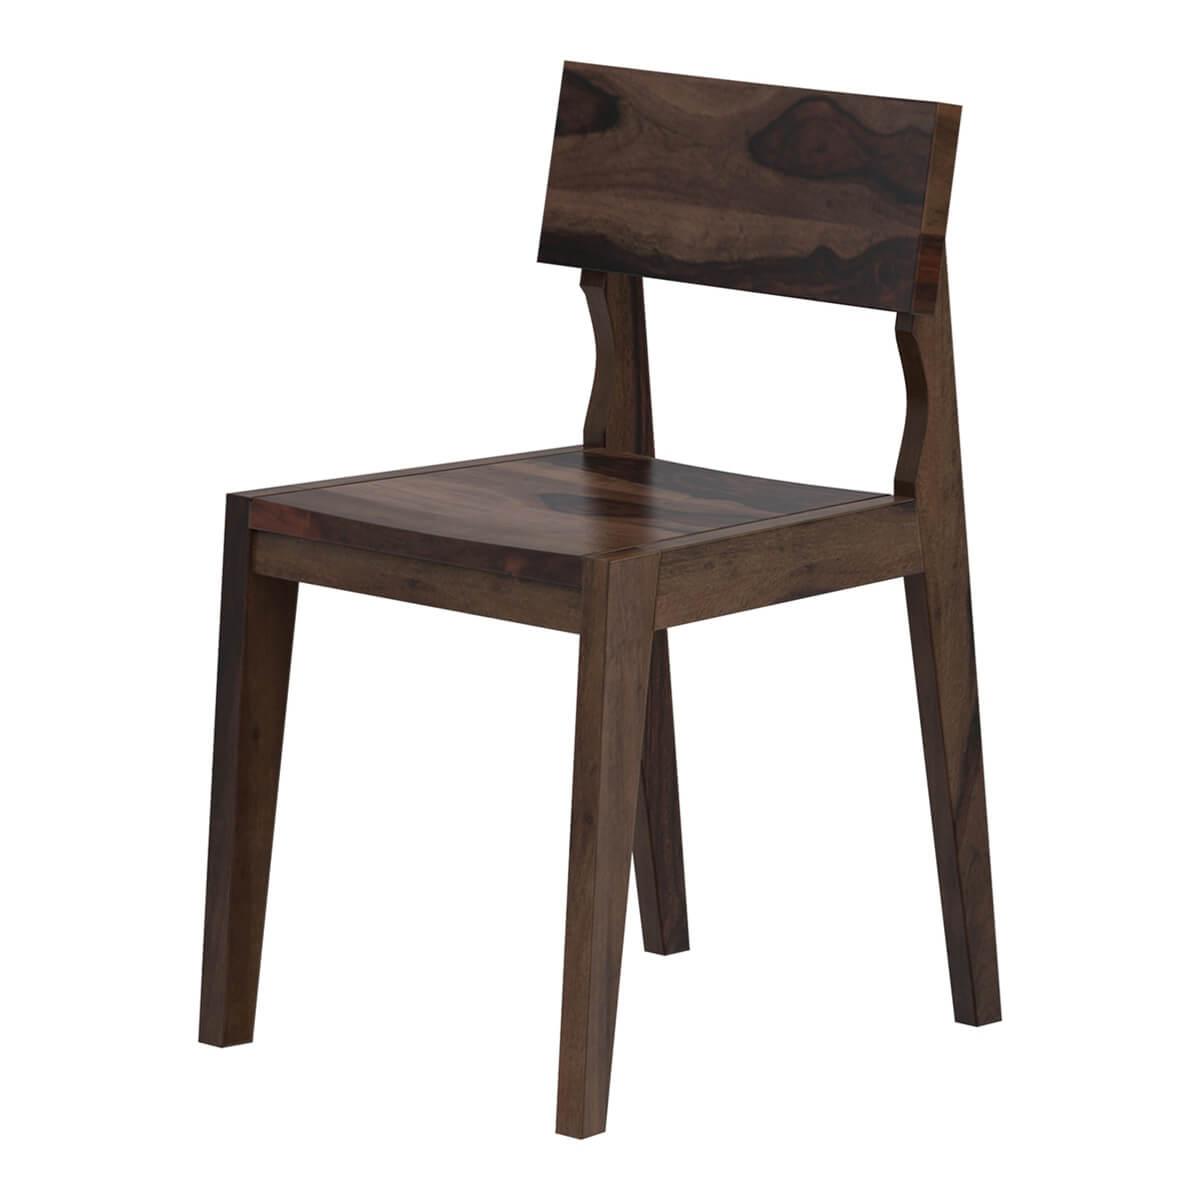 Petaluma Modern Rustic Solid Wood Dining Chair